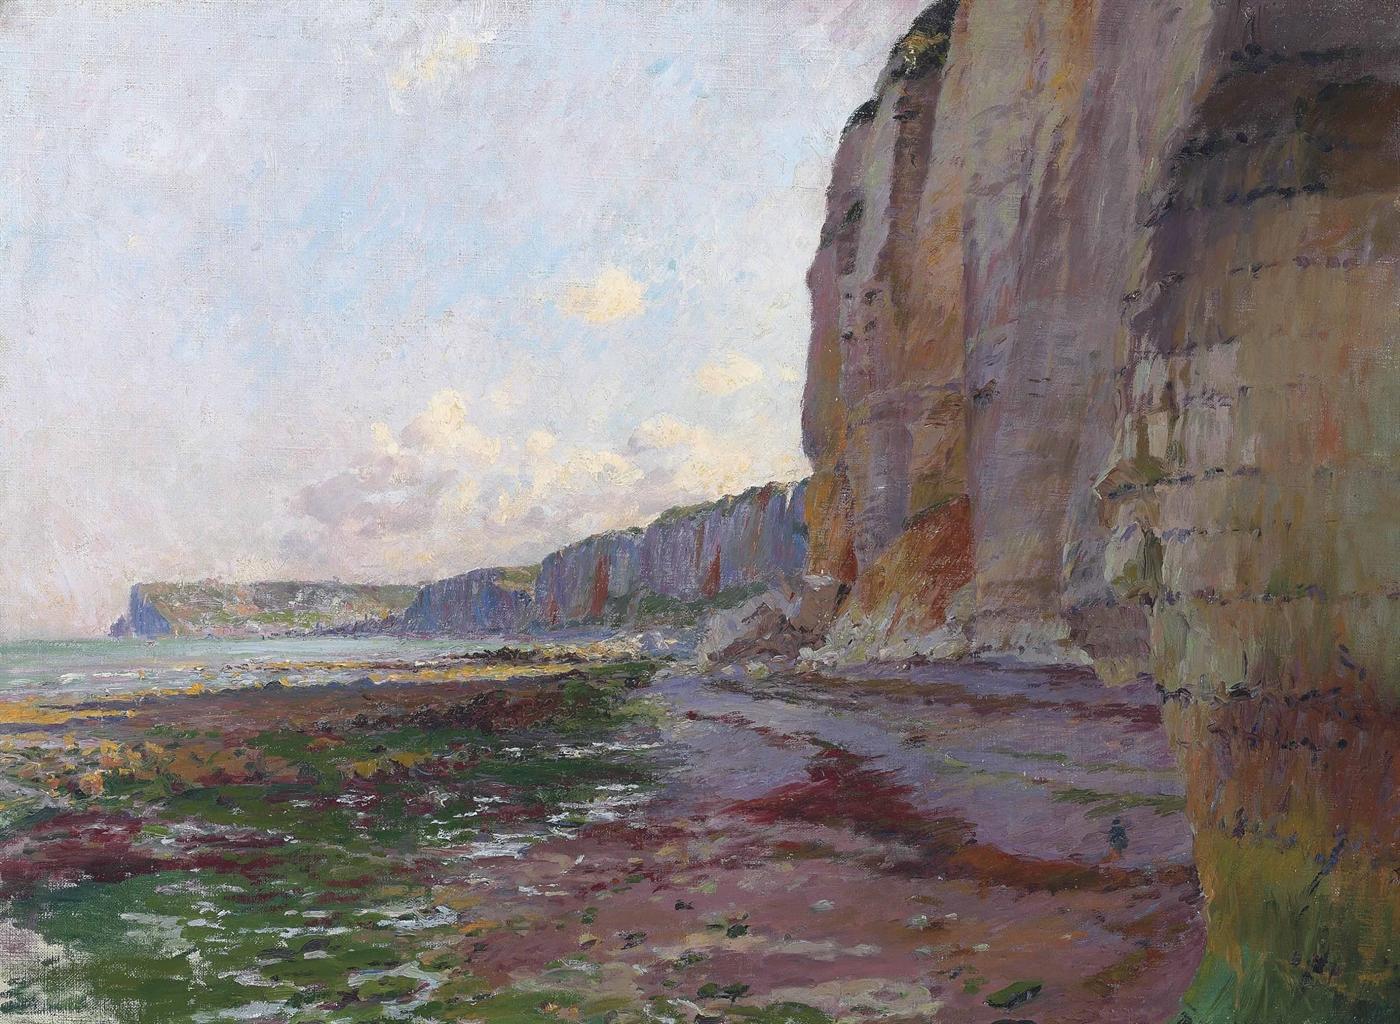 Emile Schuffenecker-Yport, falaises a maree basse-